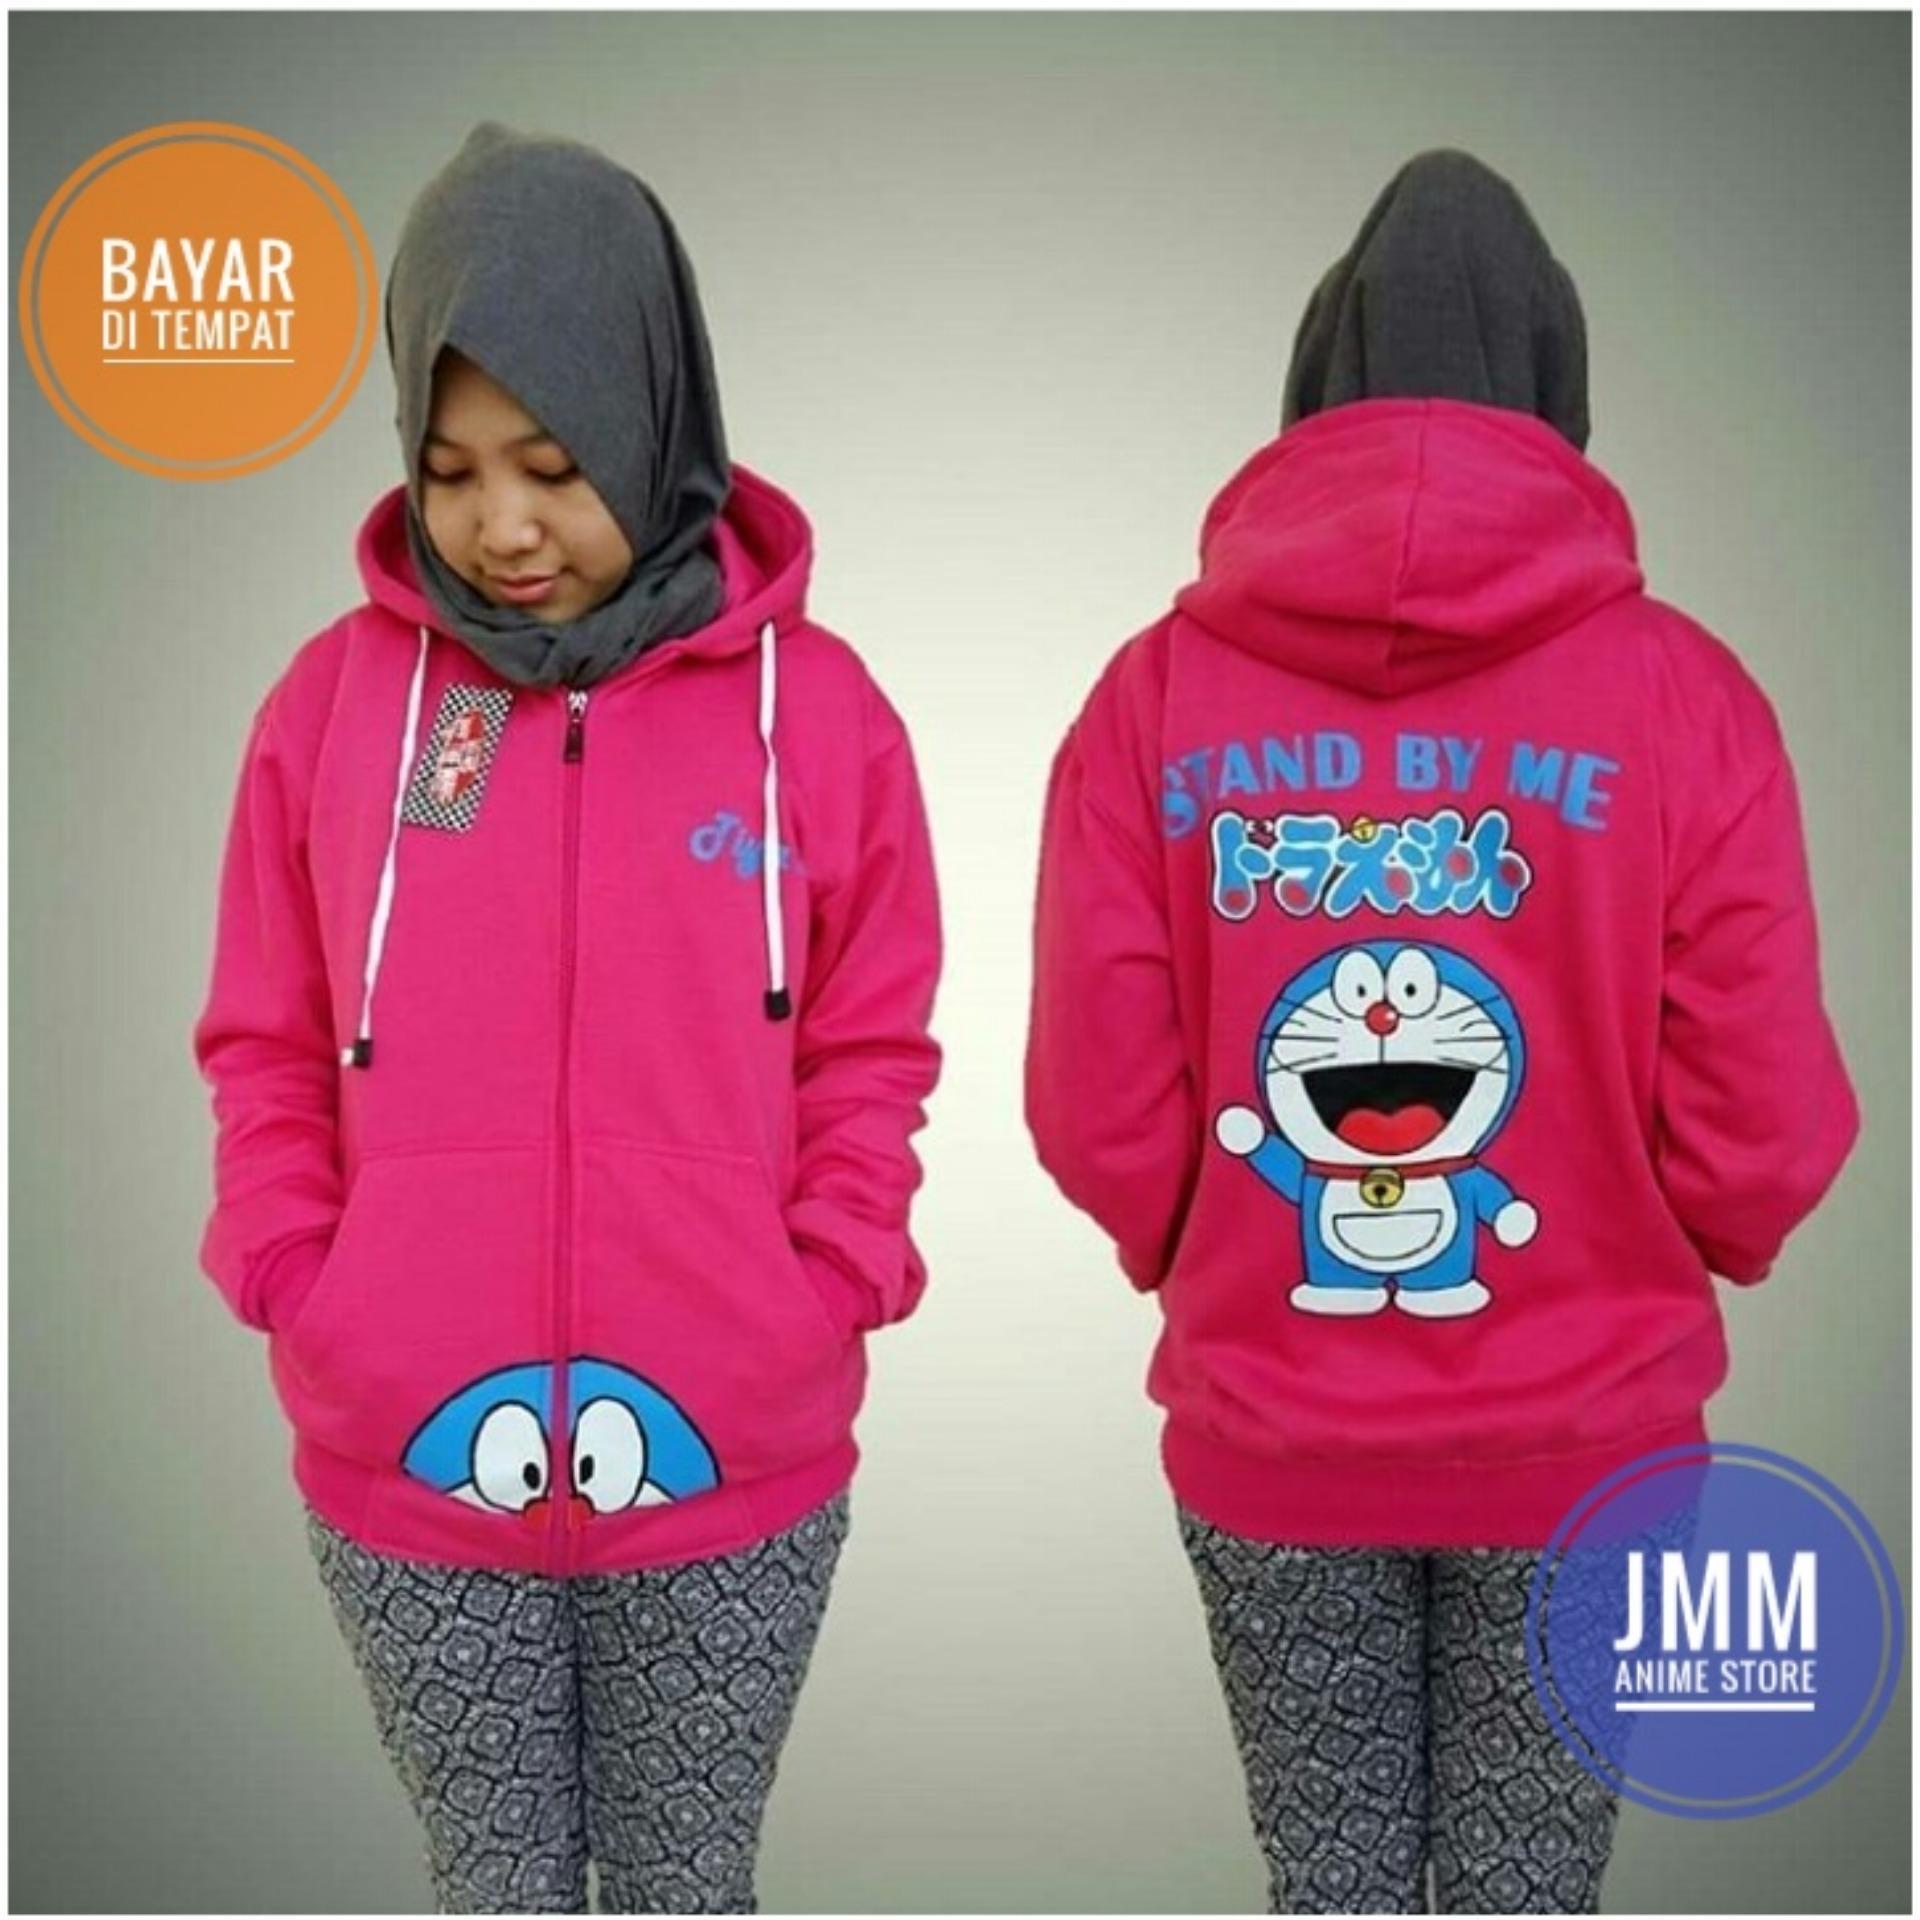 Harga Jaket Sweater Doraemon Pink Hoodie Zipper Yang Bagus